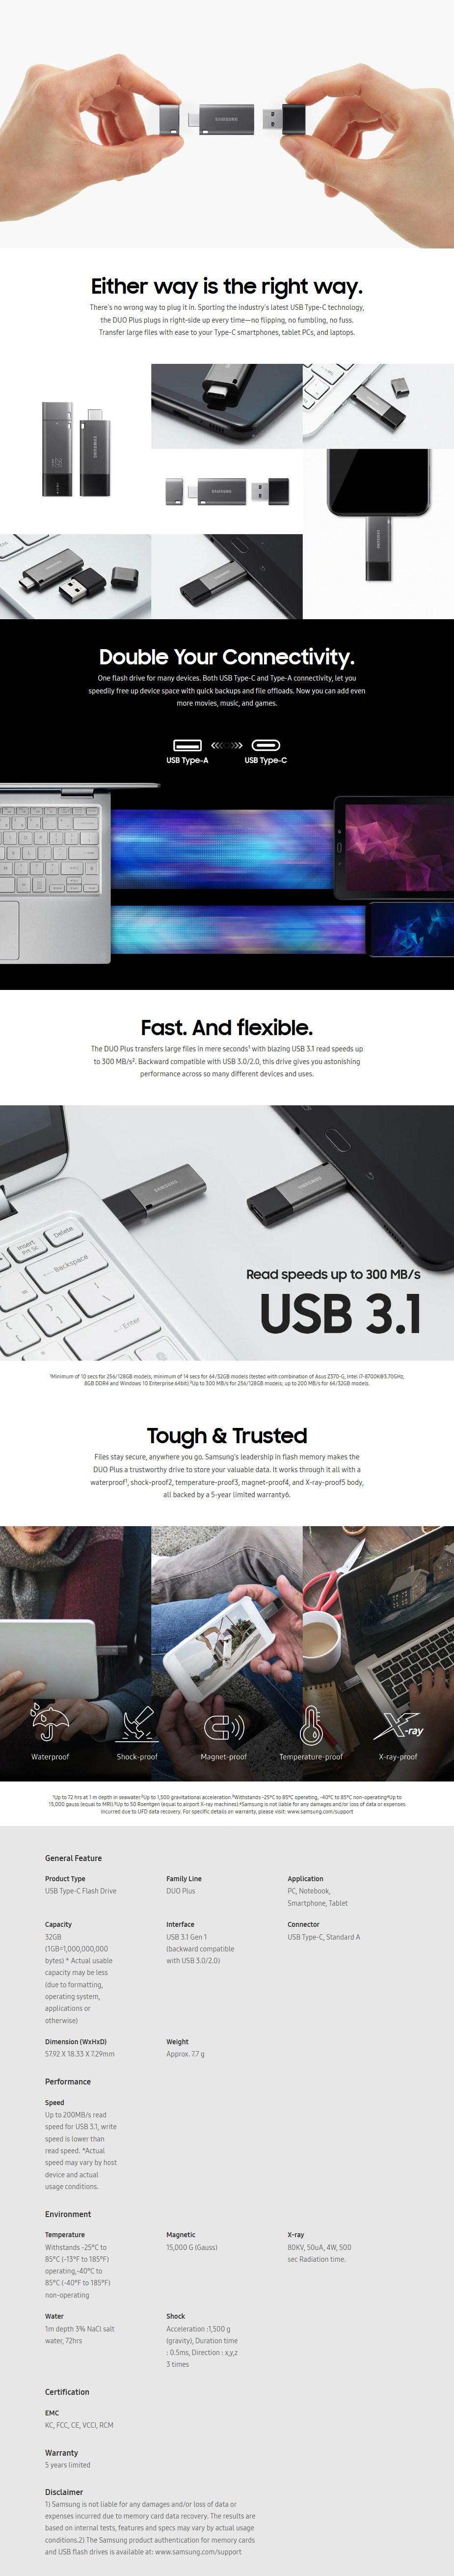 samsung-muf32dbapc-32gb-duo-plus-usbc-flash-drive-ac35191-6.jpg